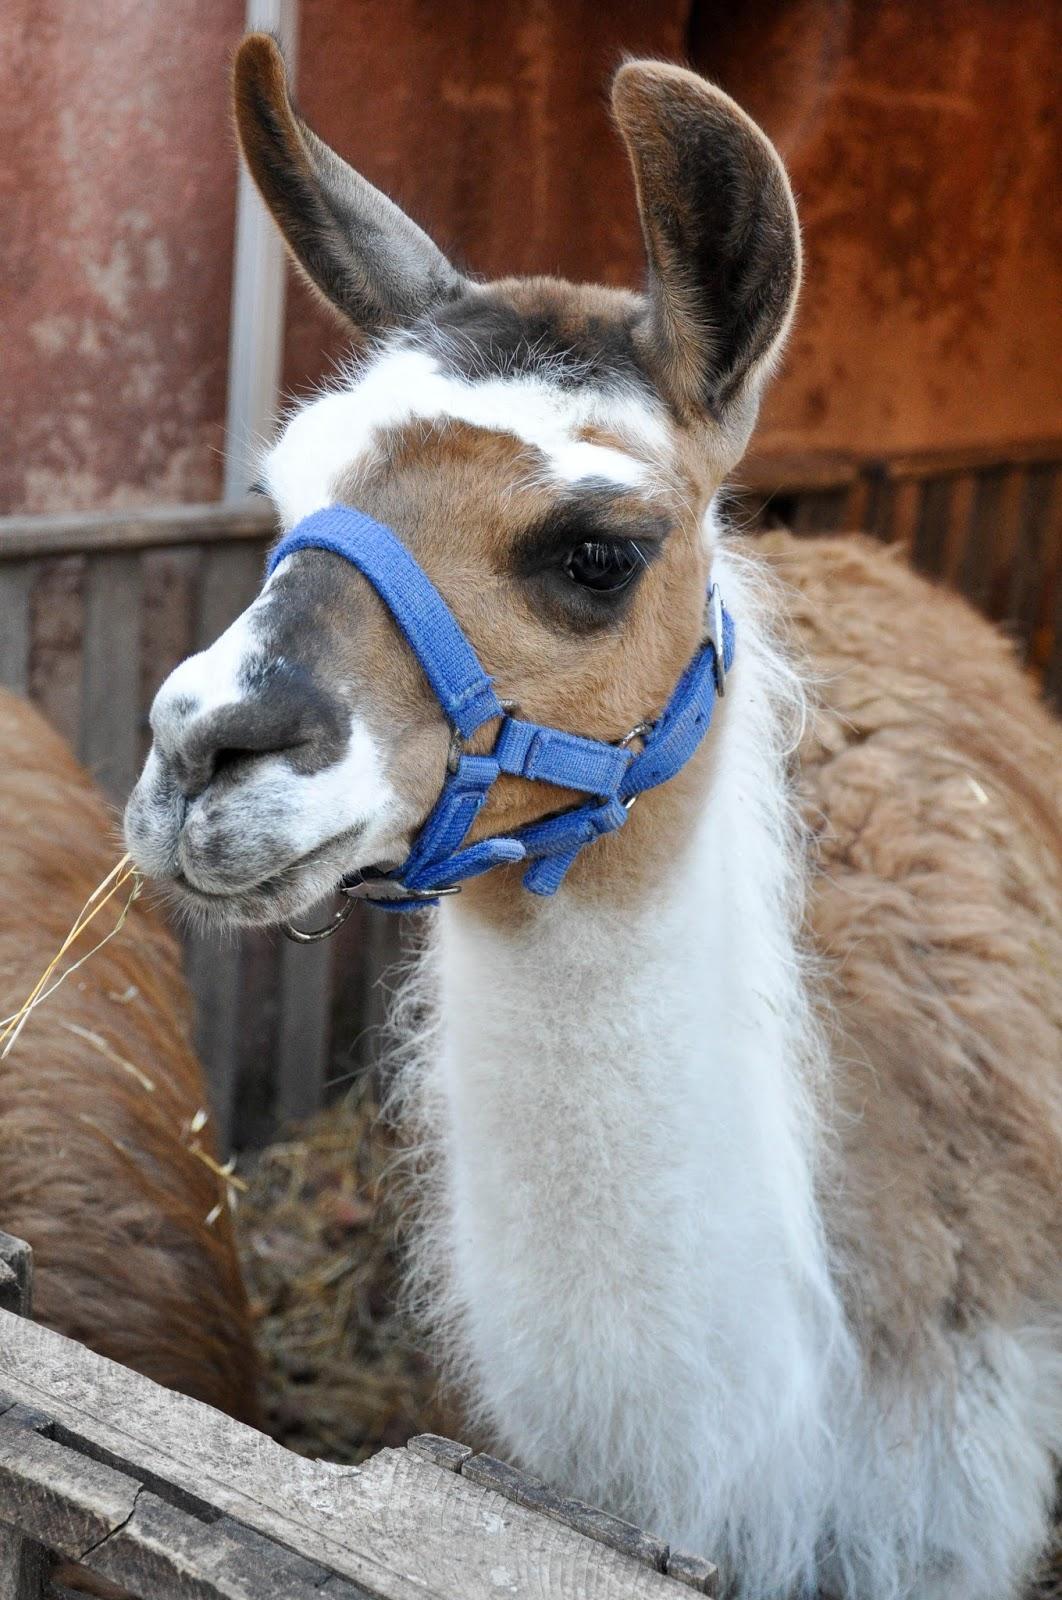 Lama, Petting zoo, Natale di Fiaba 2015, Thiene, Italy